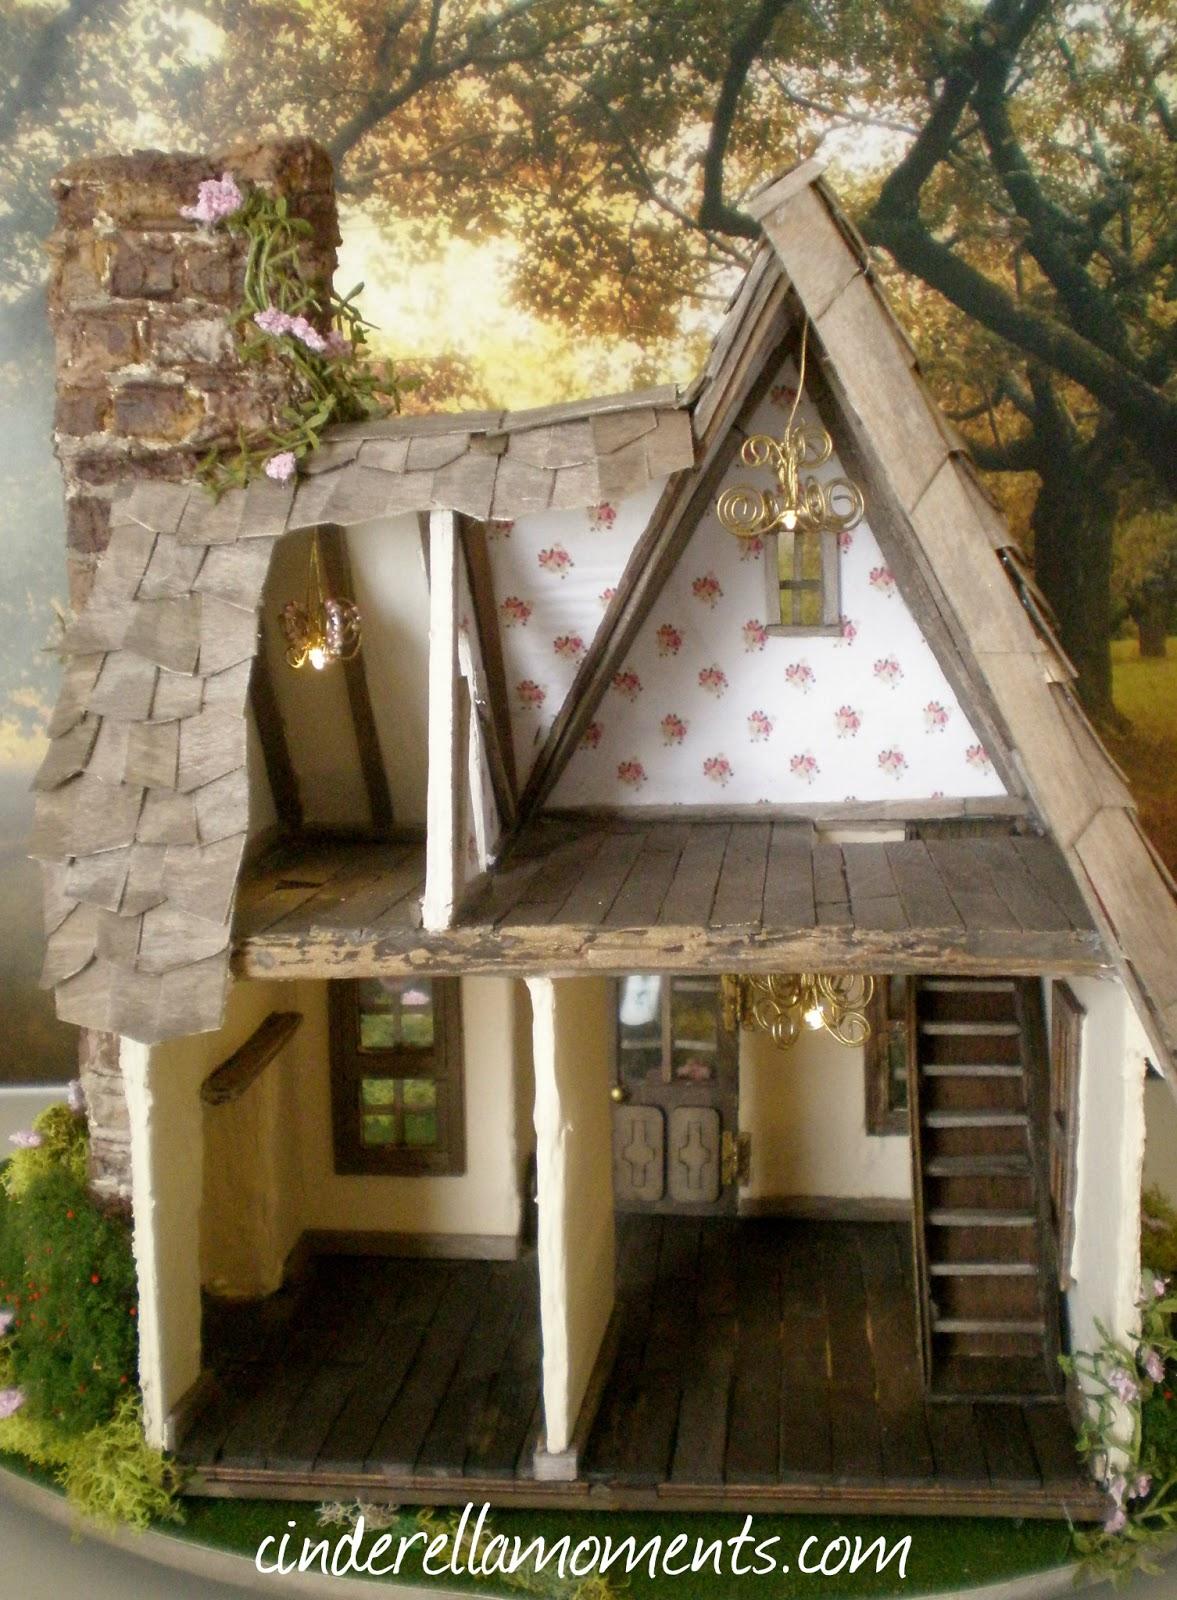 Dollhouse Miniature Garden Shed